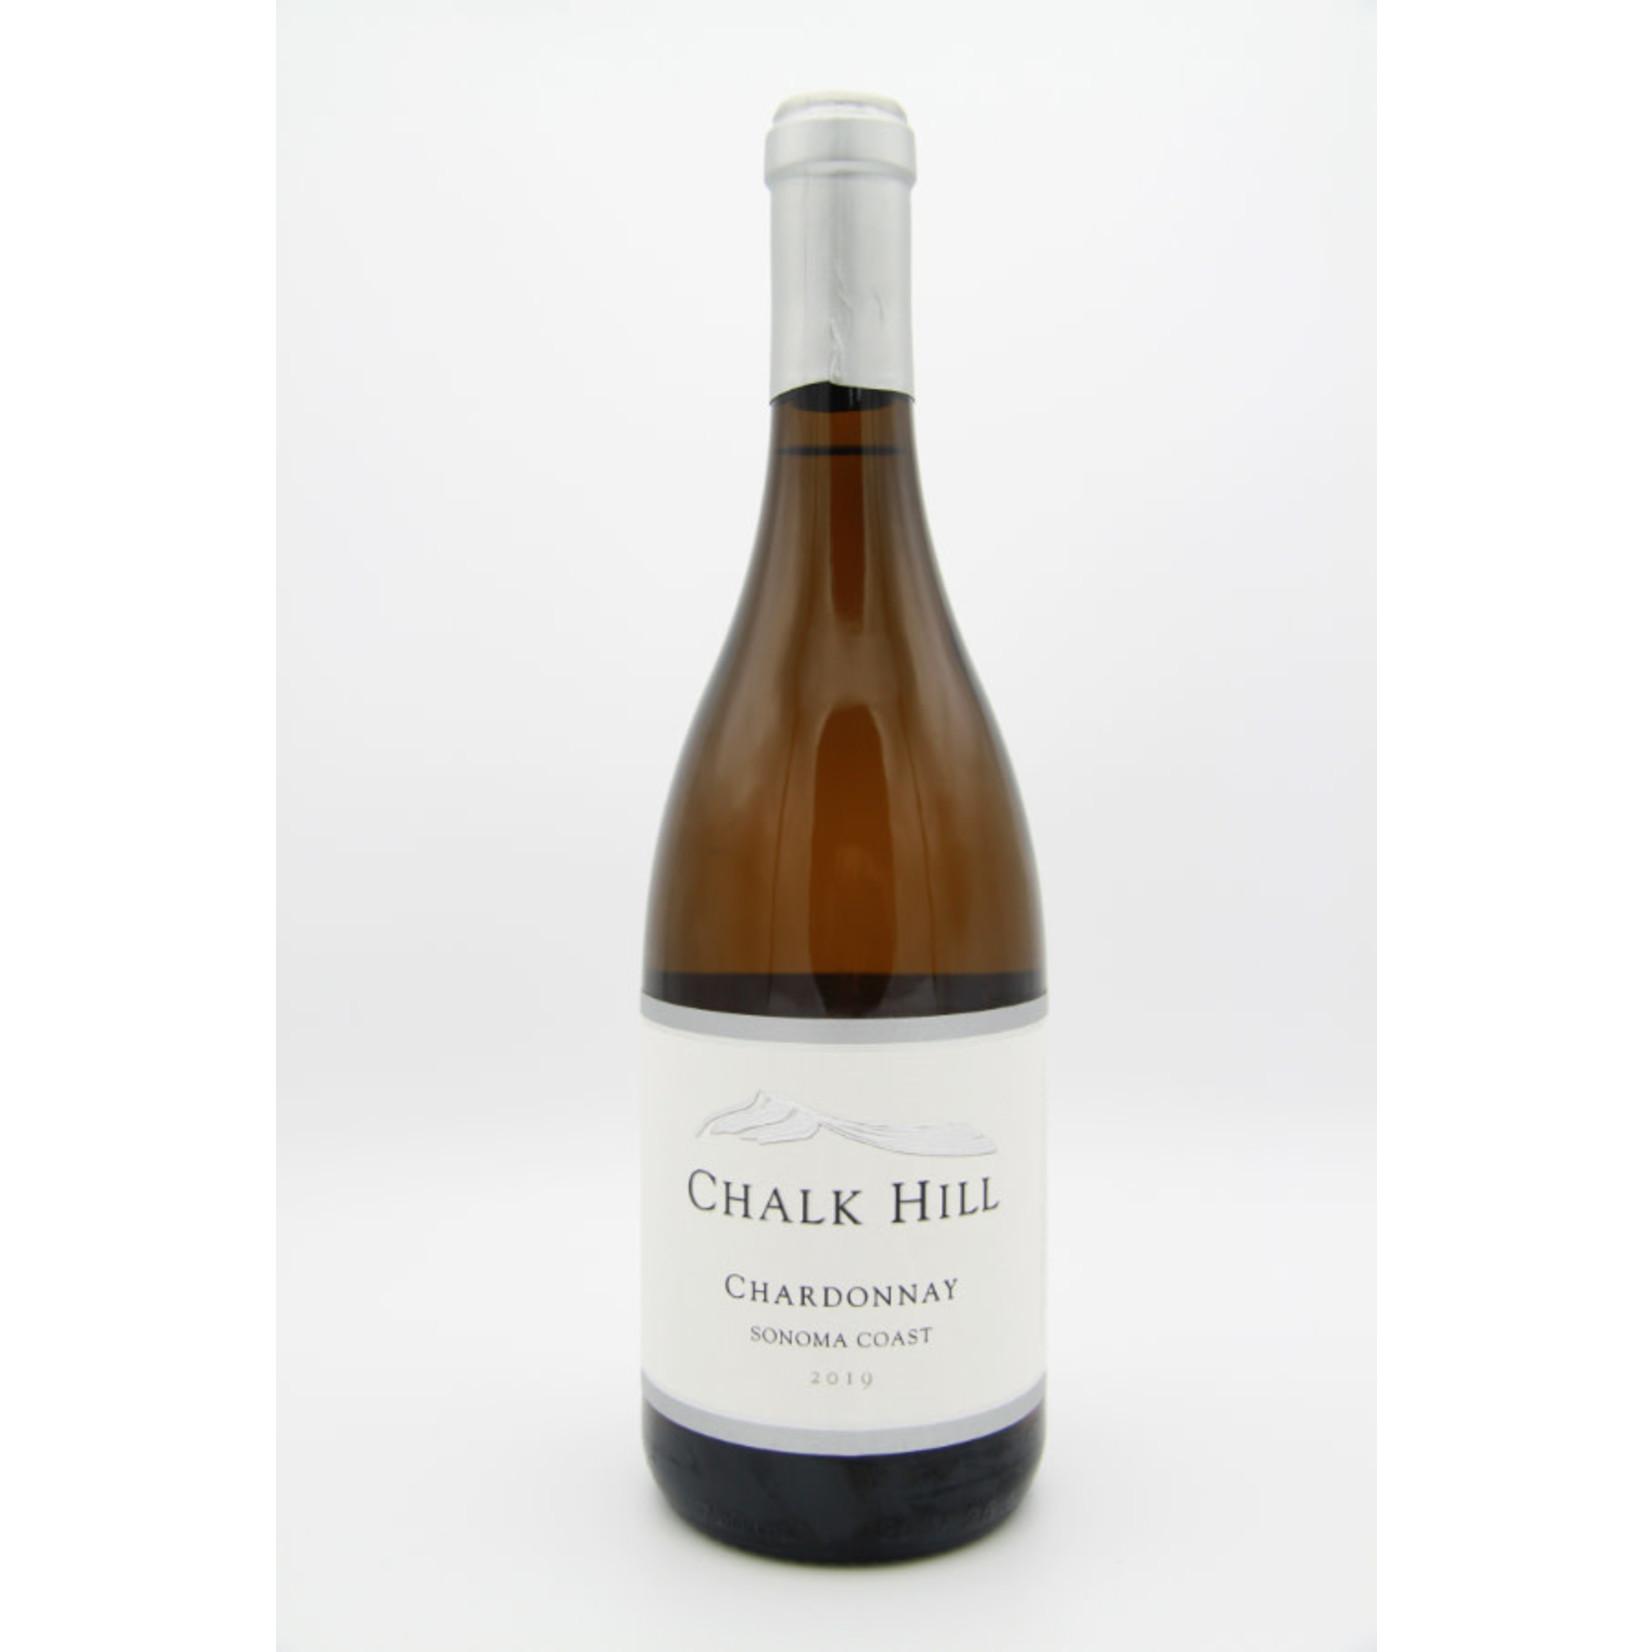 2019 Chalk Hill Sonoma Coast Chardonnay